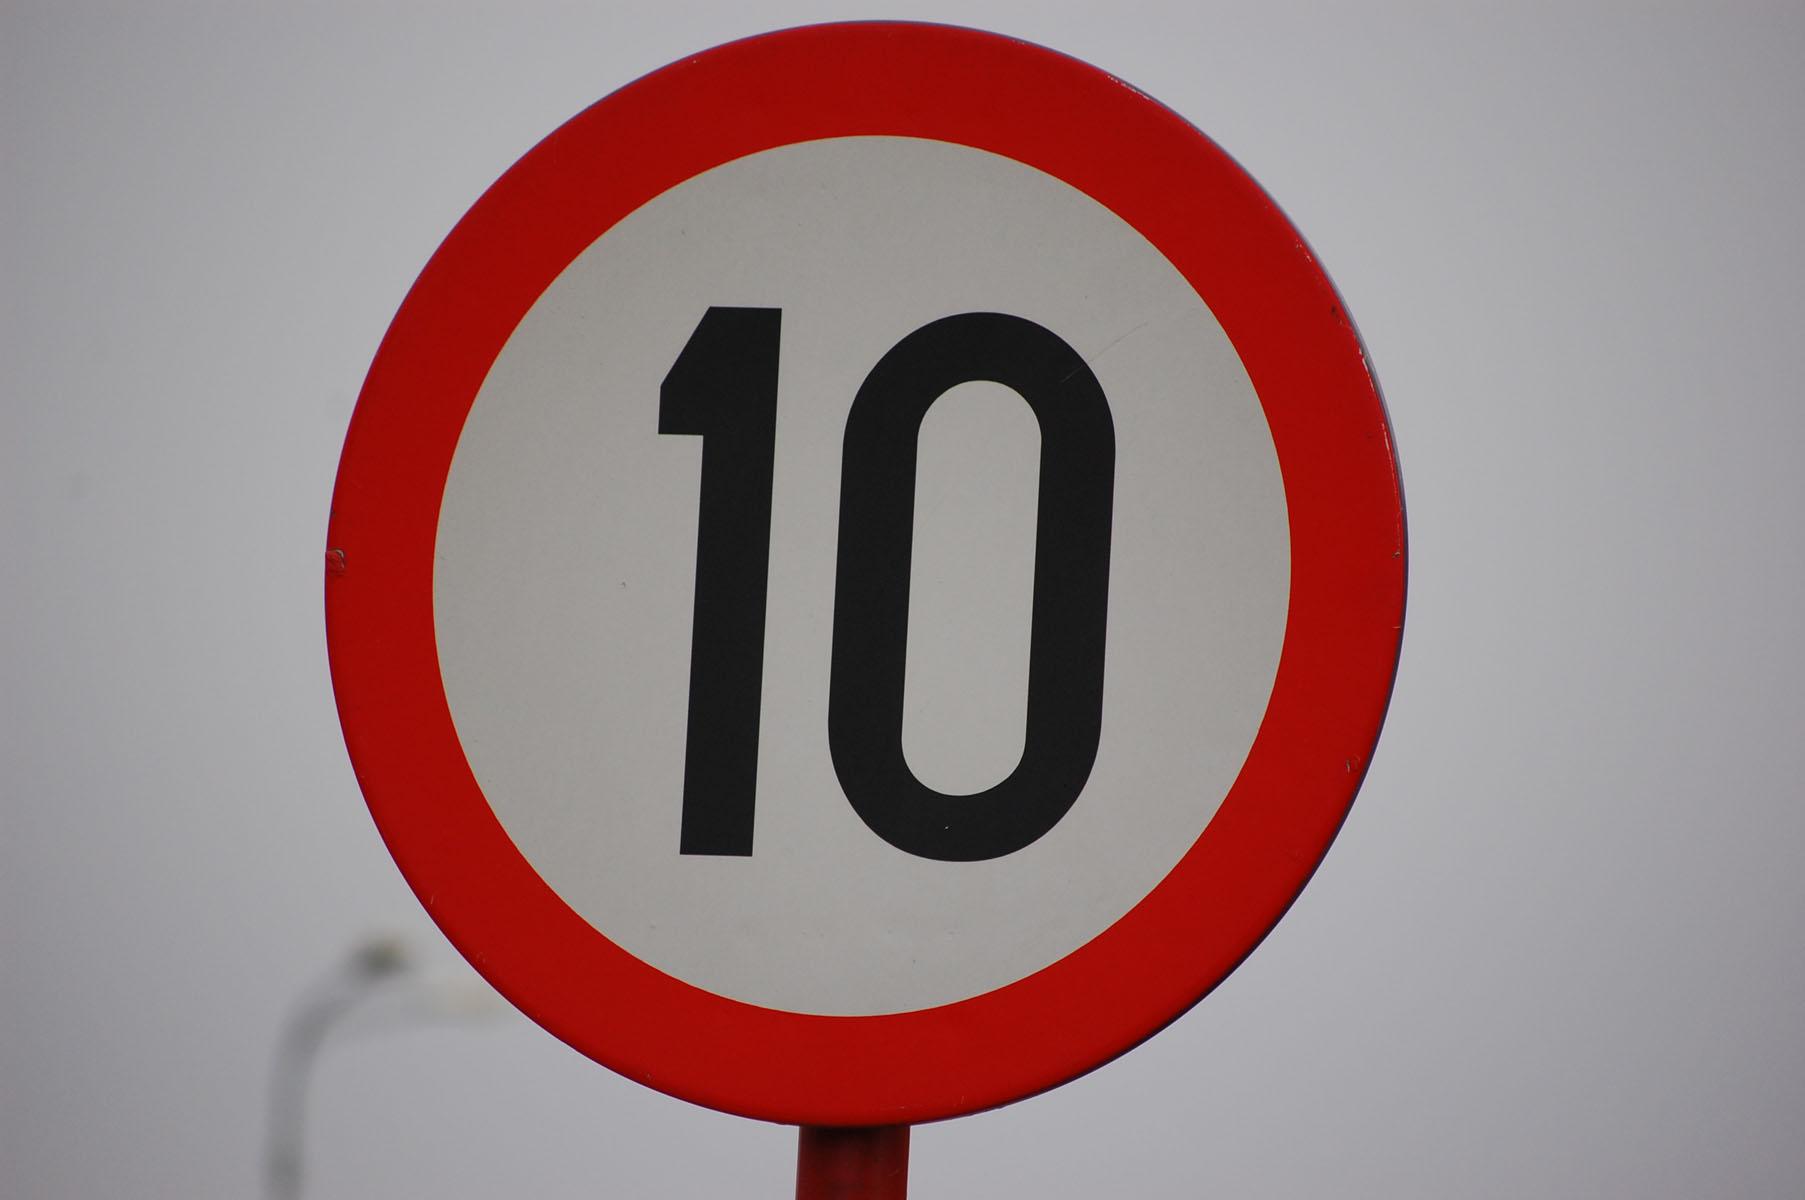 10 traffic sign